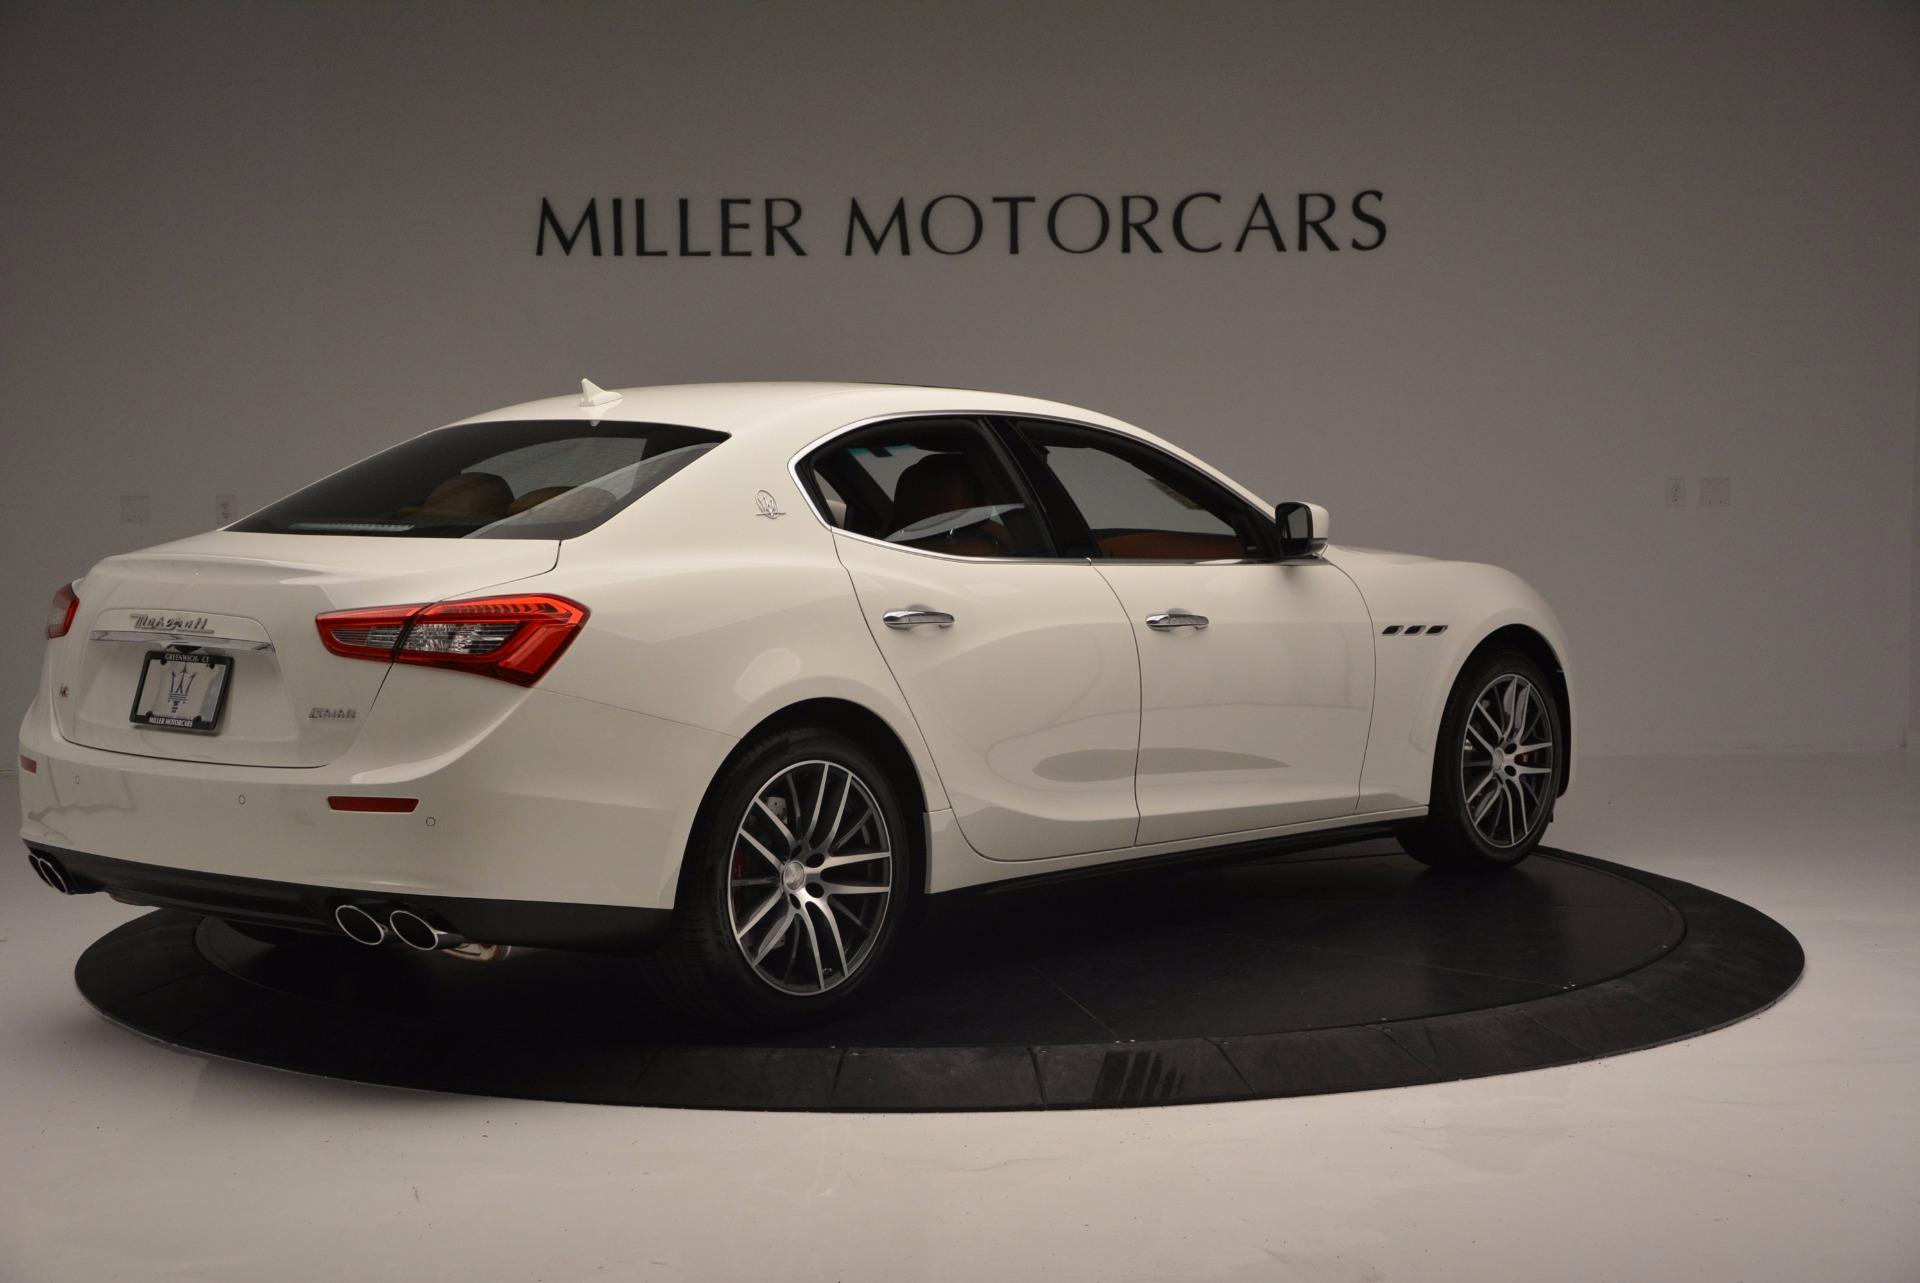 Used 2017 Maserati Ghibli S Q4 Ex-Loaner For Sale In Greenwich, CT 1166_p8